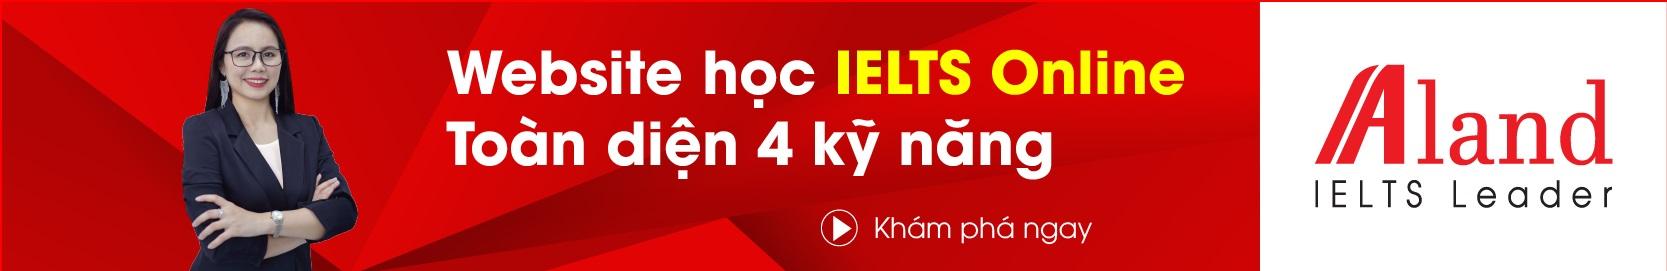 Aland IELTS - Website học IELTS online toàn diện 4 kỹ năng